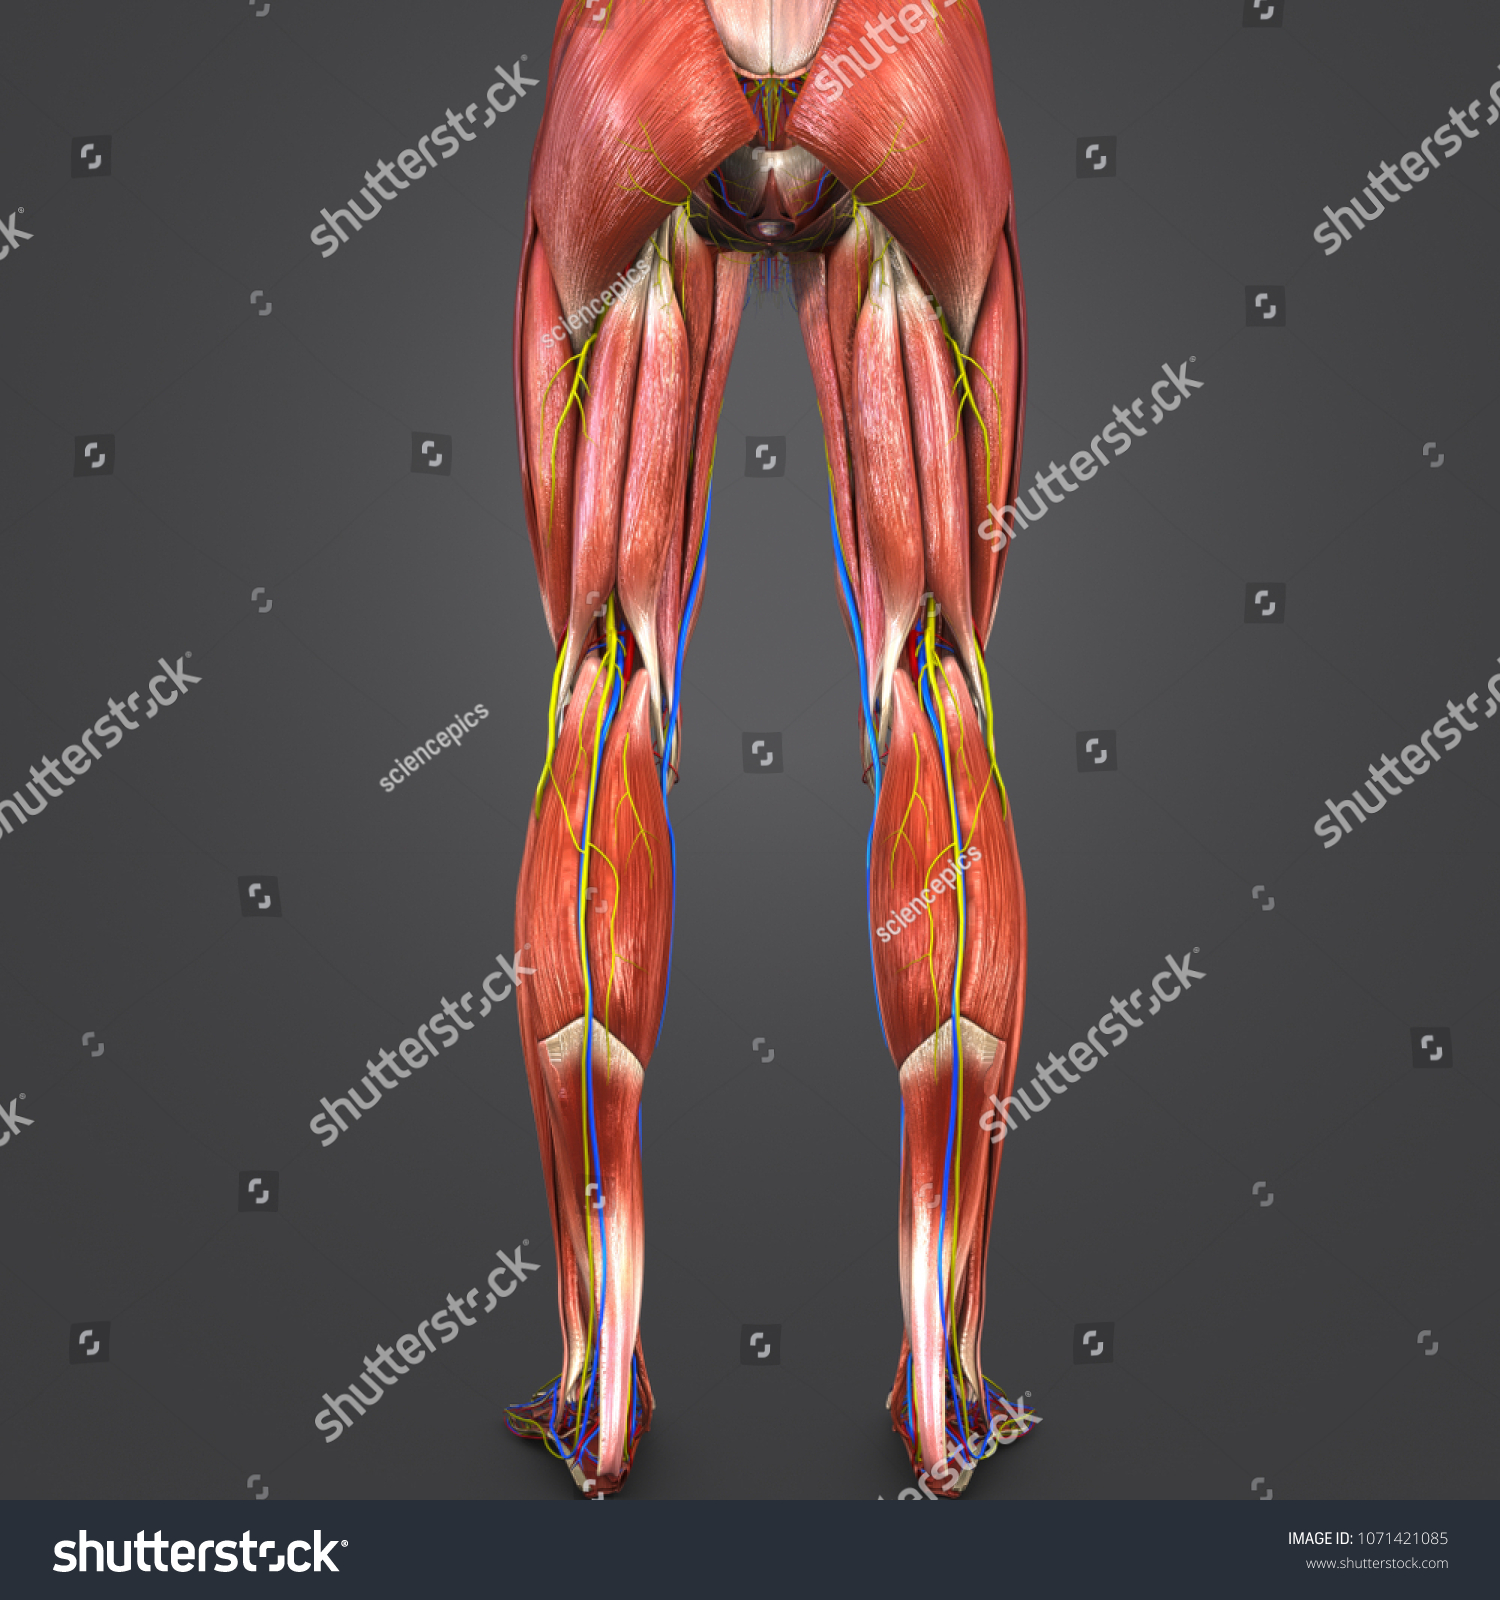 Lower Limbs Muscles Anatomy Arteries Veins Stock Illustration ...